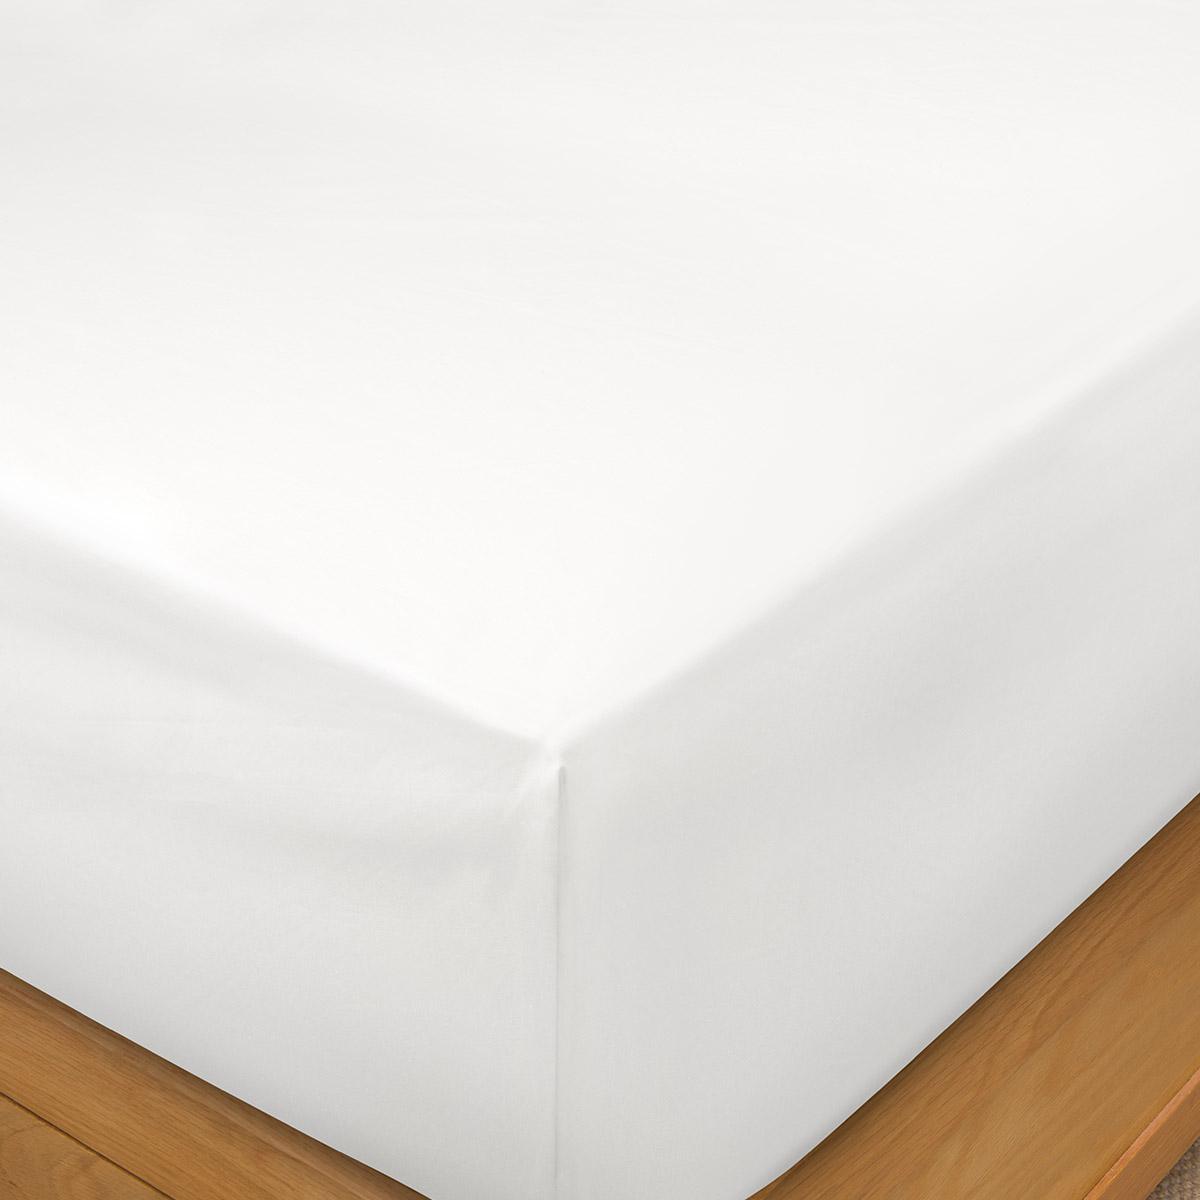 White 1000 Thread Count Supima Cotton King Size Flat Sheet